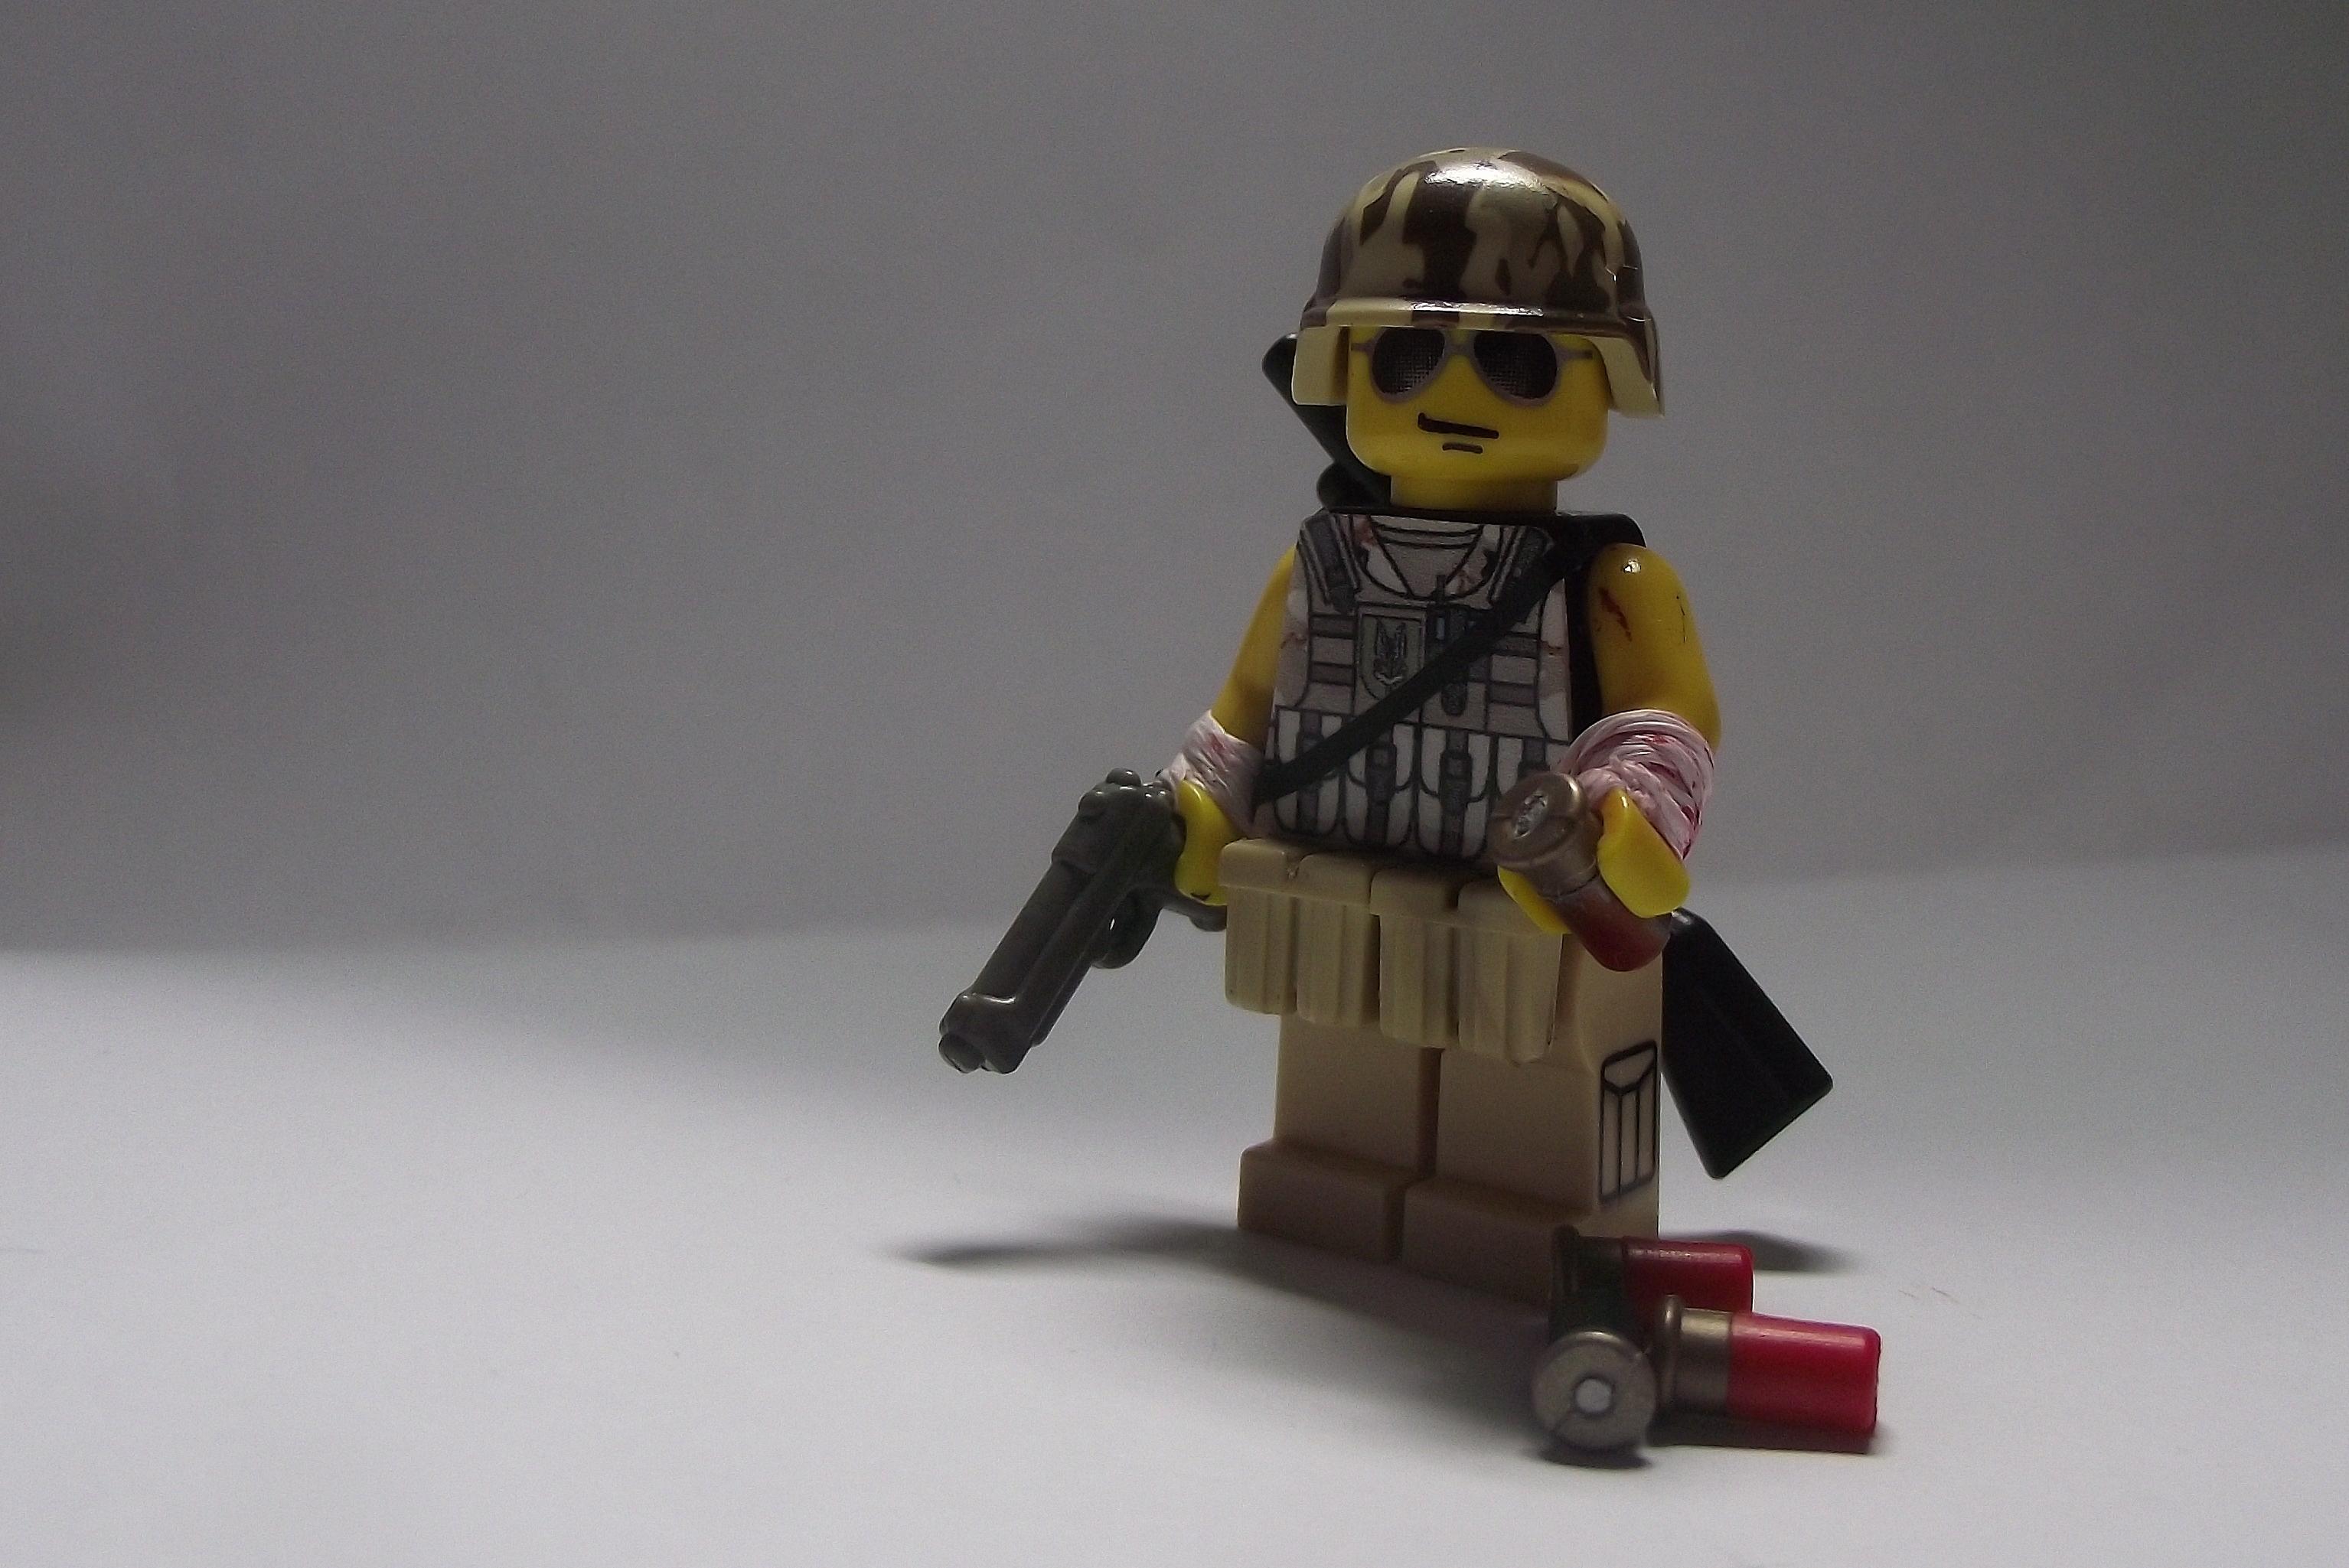 Wallpaper : Trooper, man, army, us, fight, war, LEGO